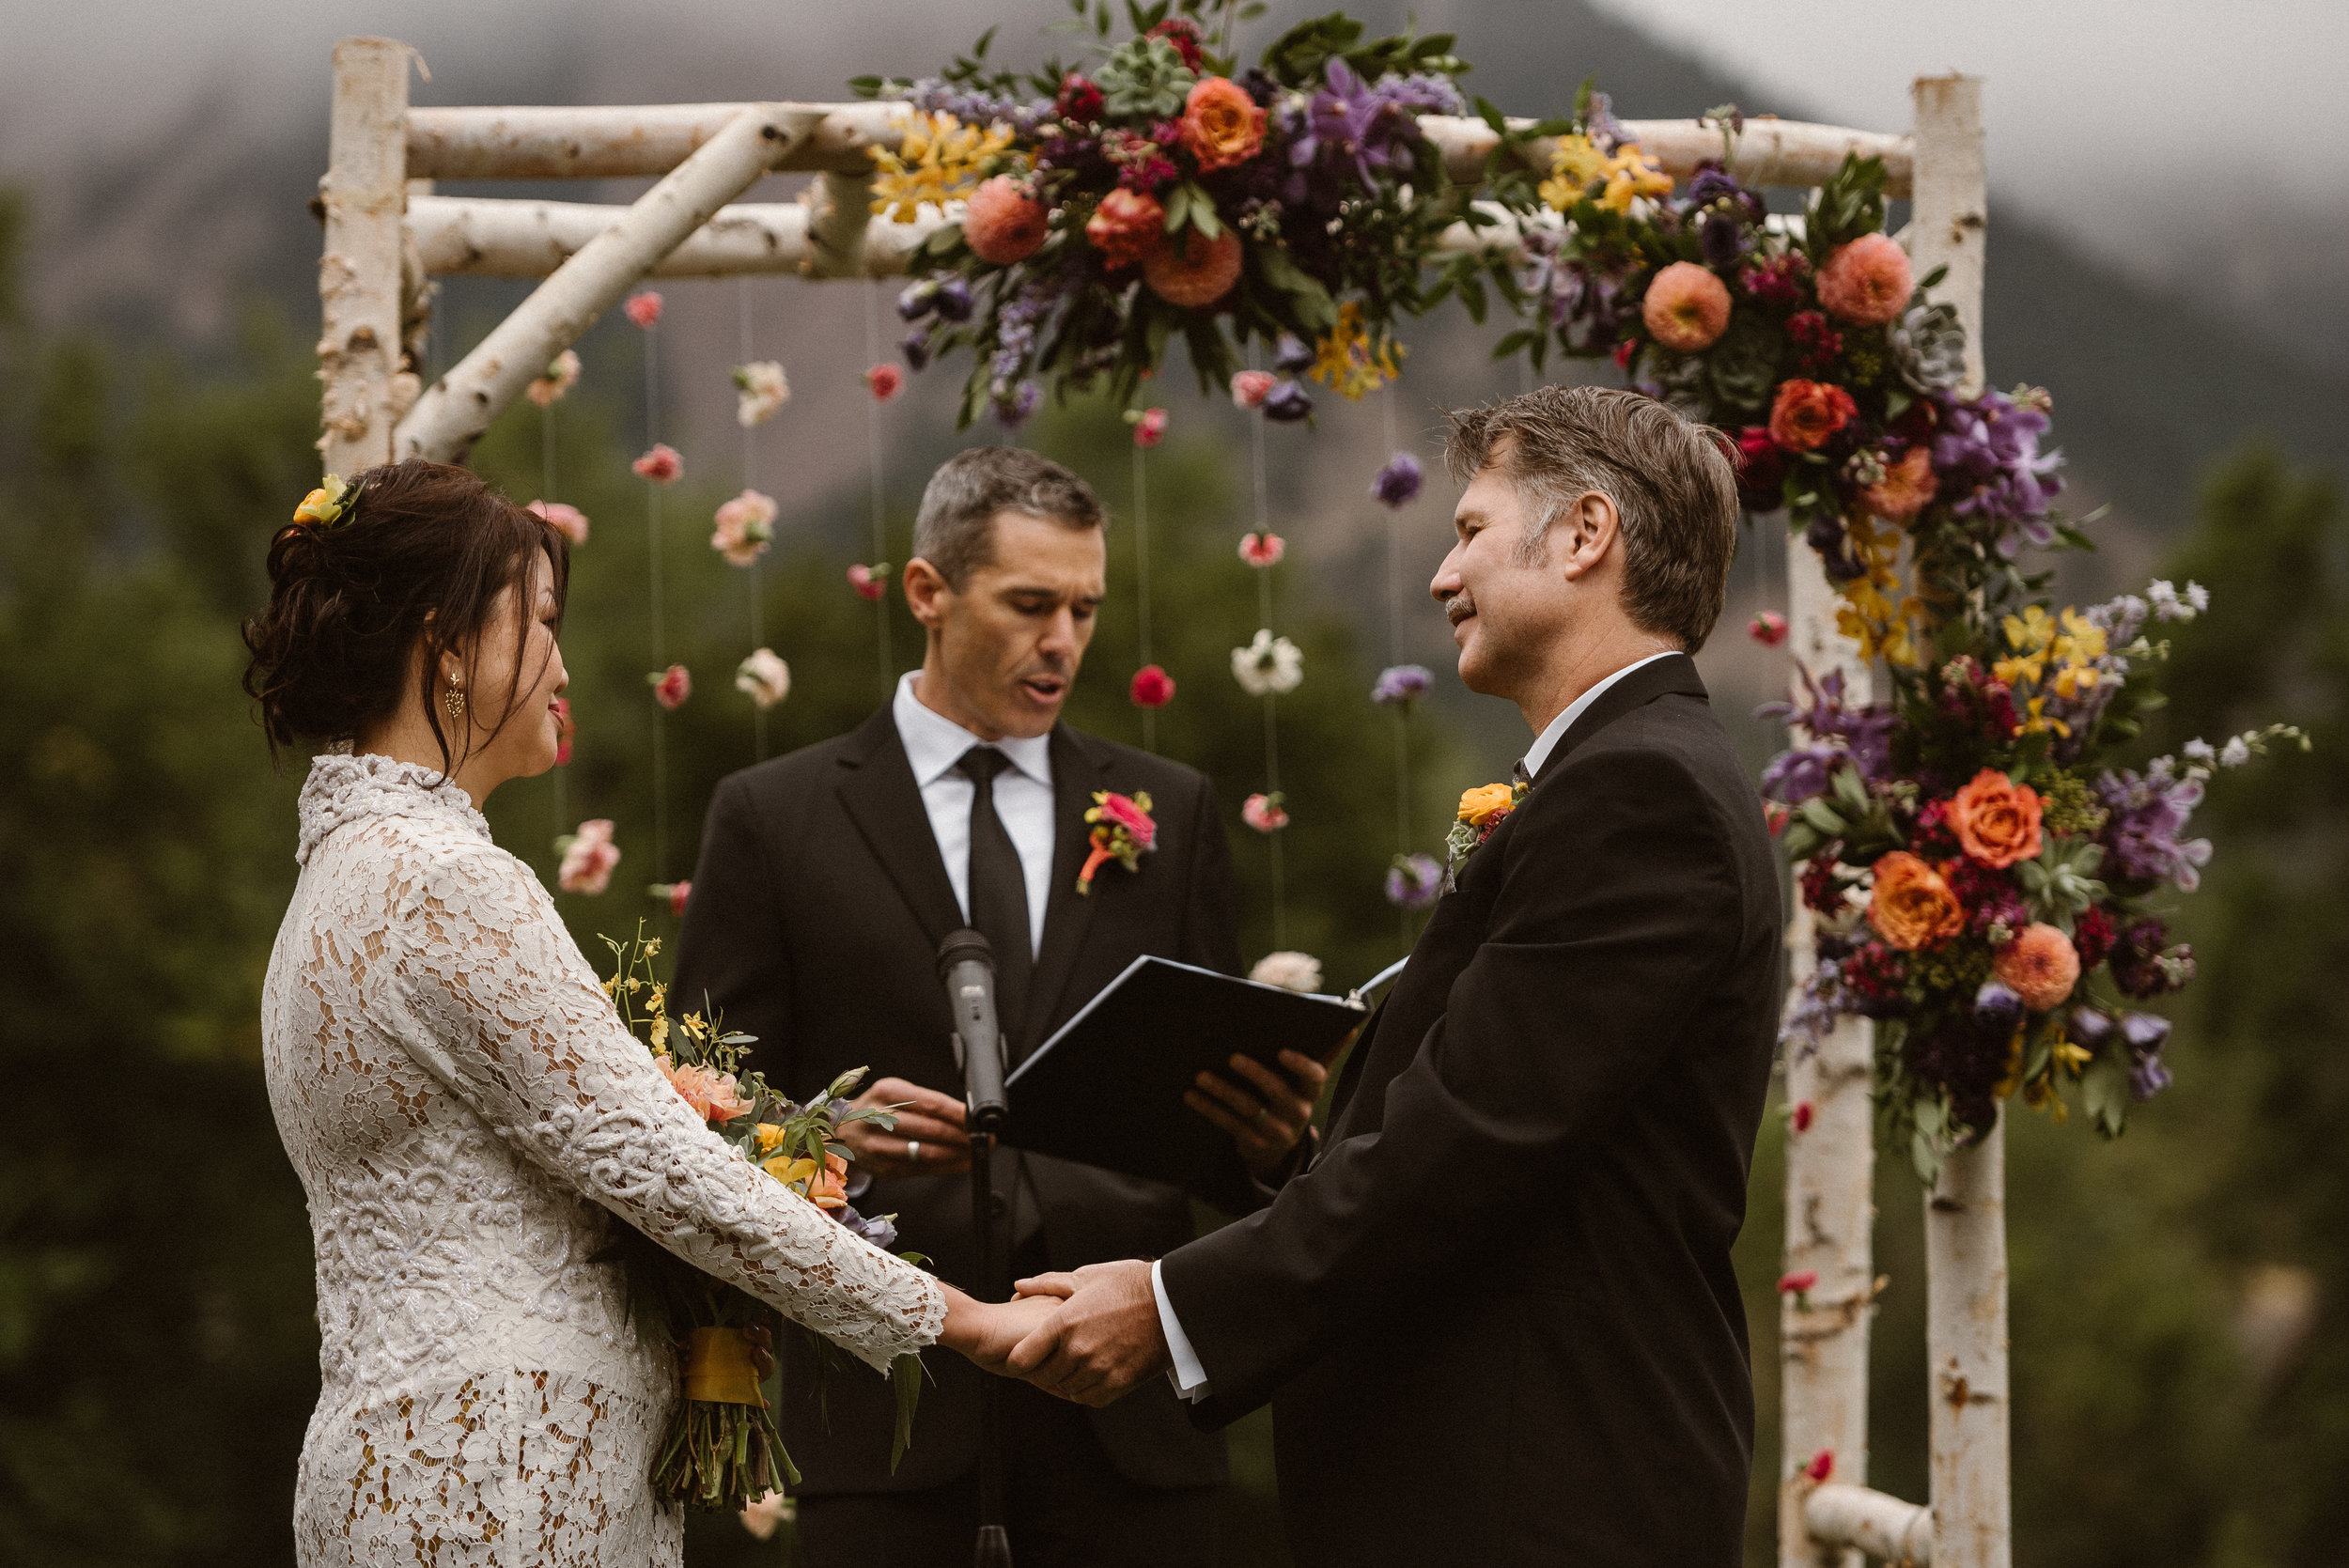 Chautauqua Park Morning Wedding Ceremony in Boulder, Colorado